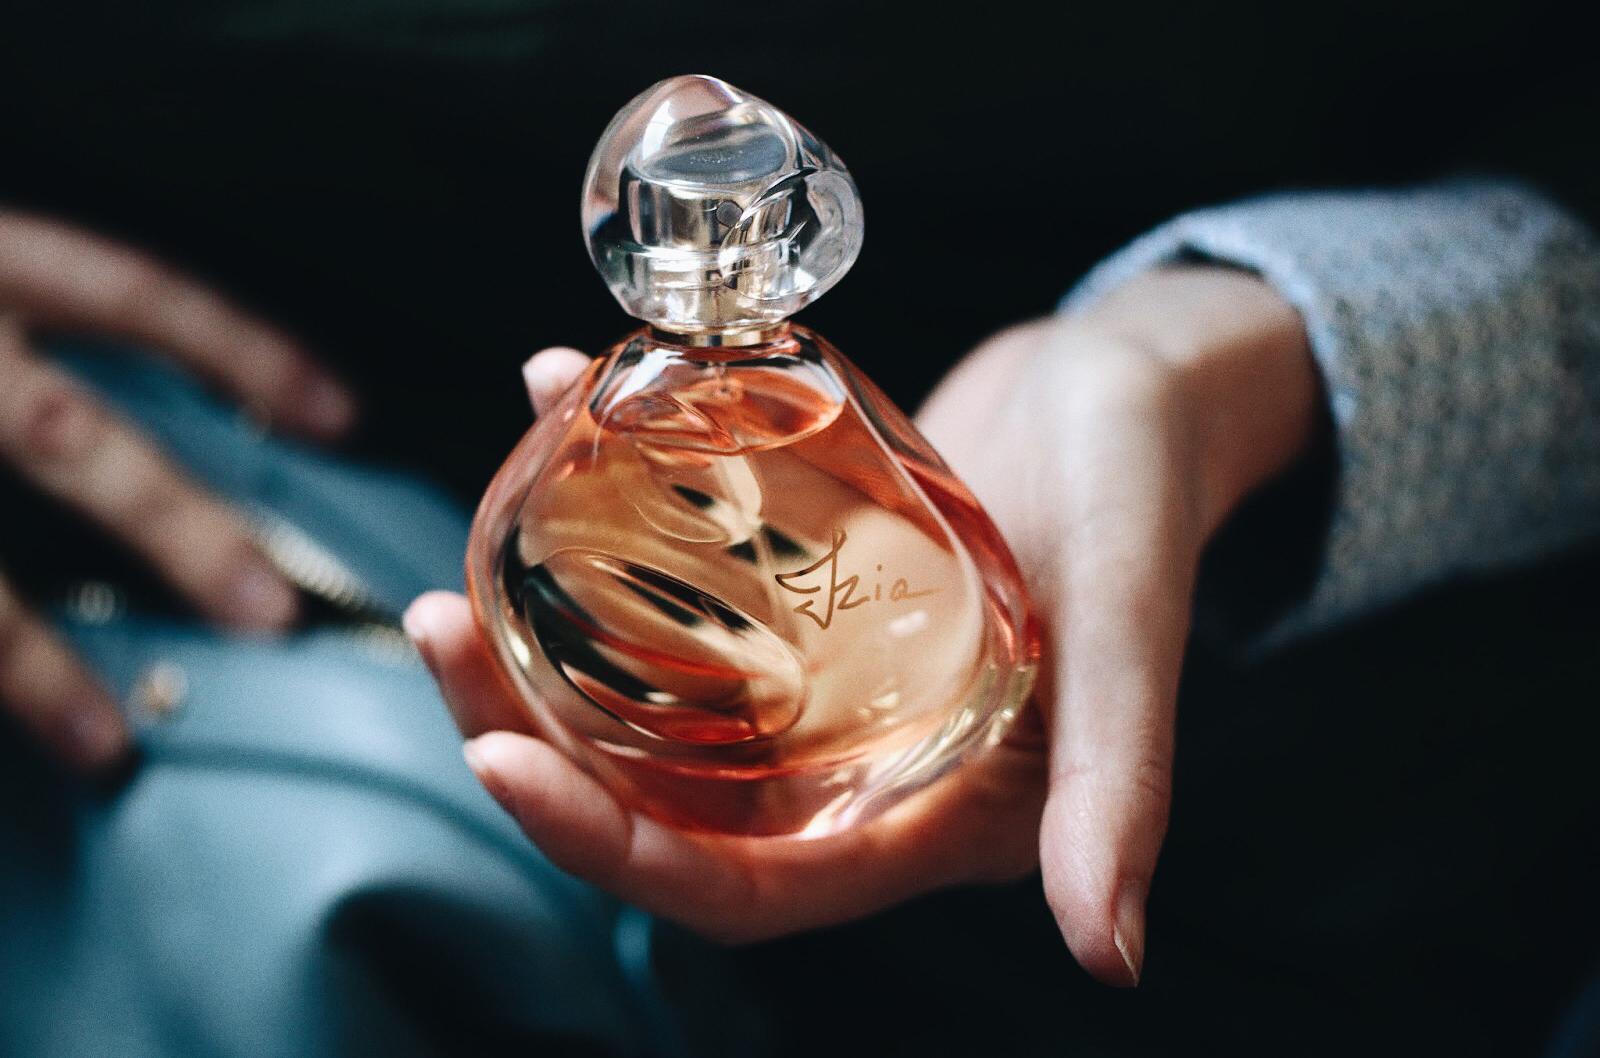 sisley izia eau de parfum avis test